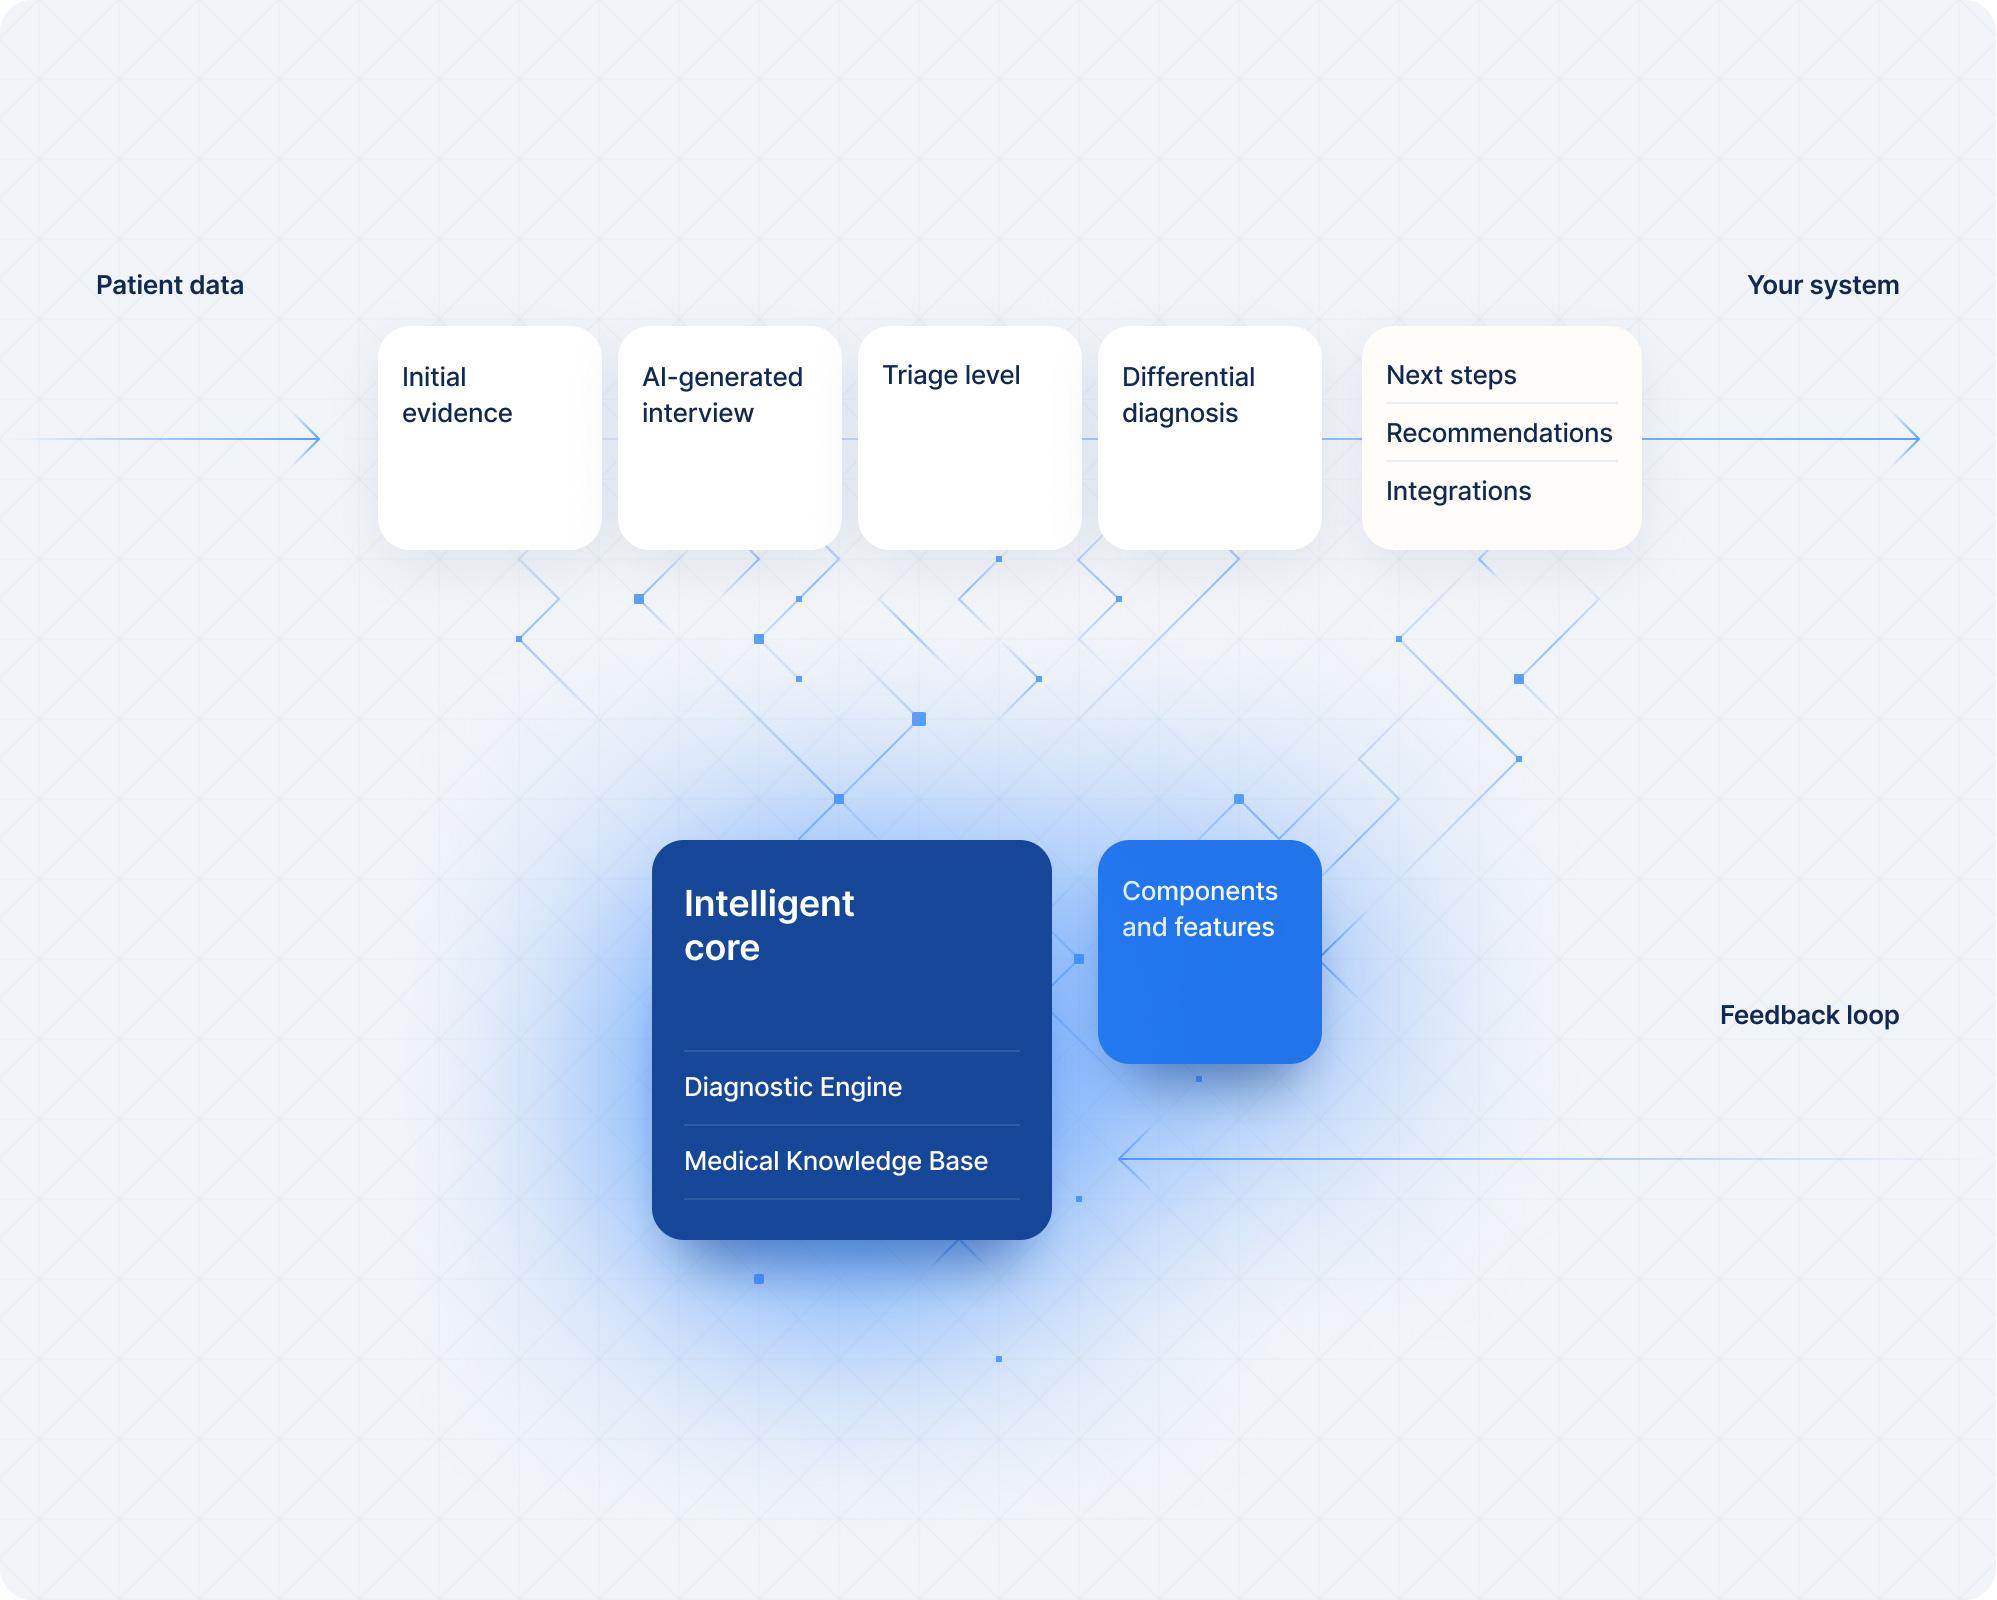 Intelligent core feedback loop